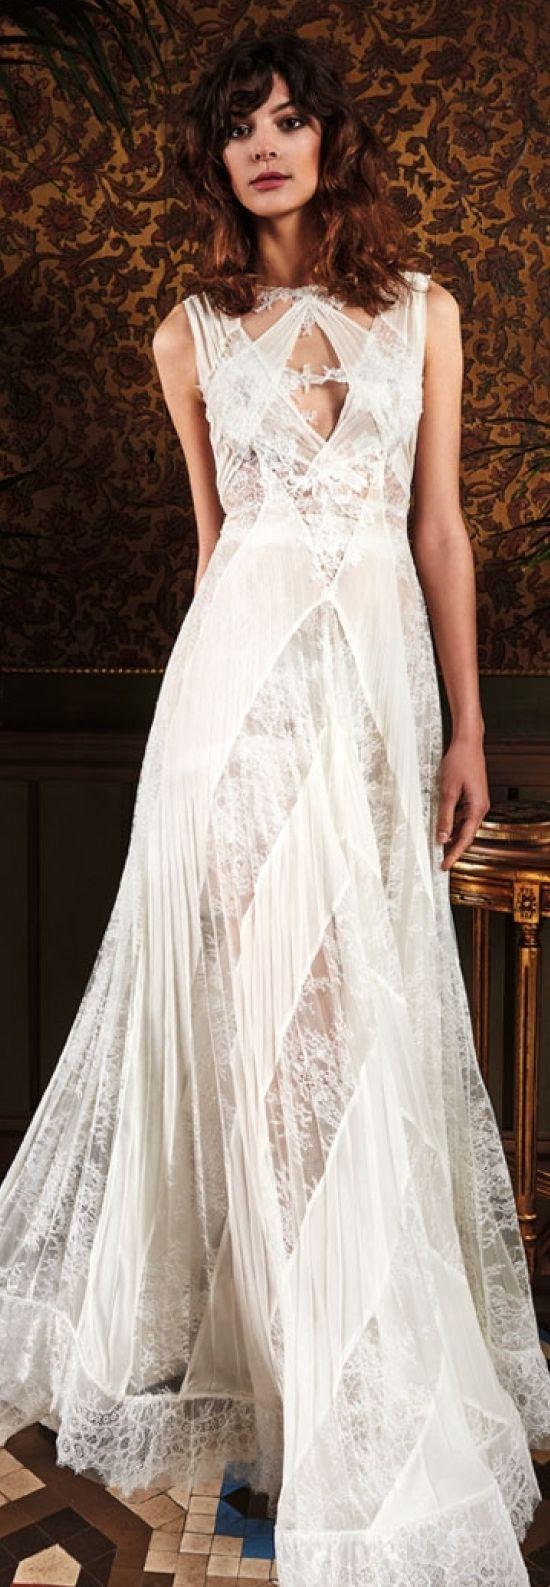 Boho chic wedding dresses bohemian lace wedding dress yolan